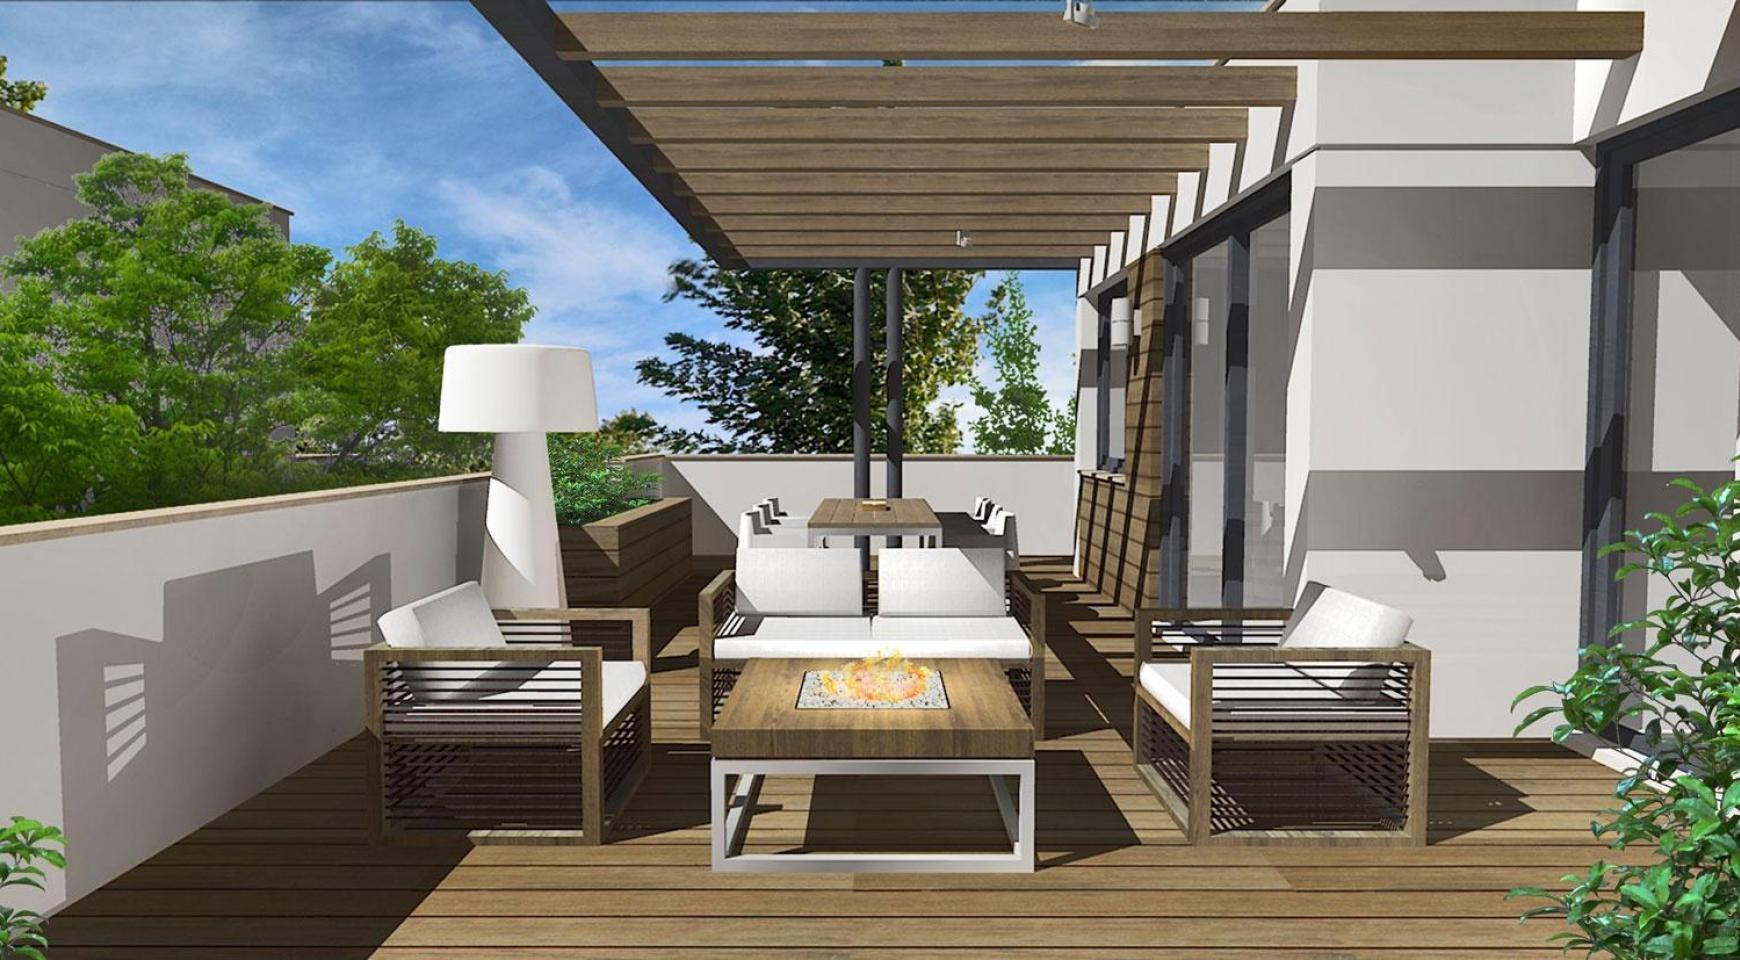 Spacious 4 Bedroom Villa in a New Complex in Agios Athanasios Area - 6